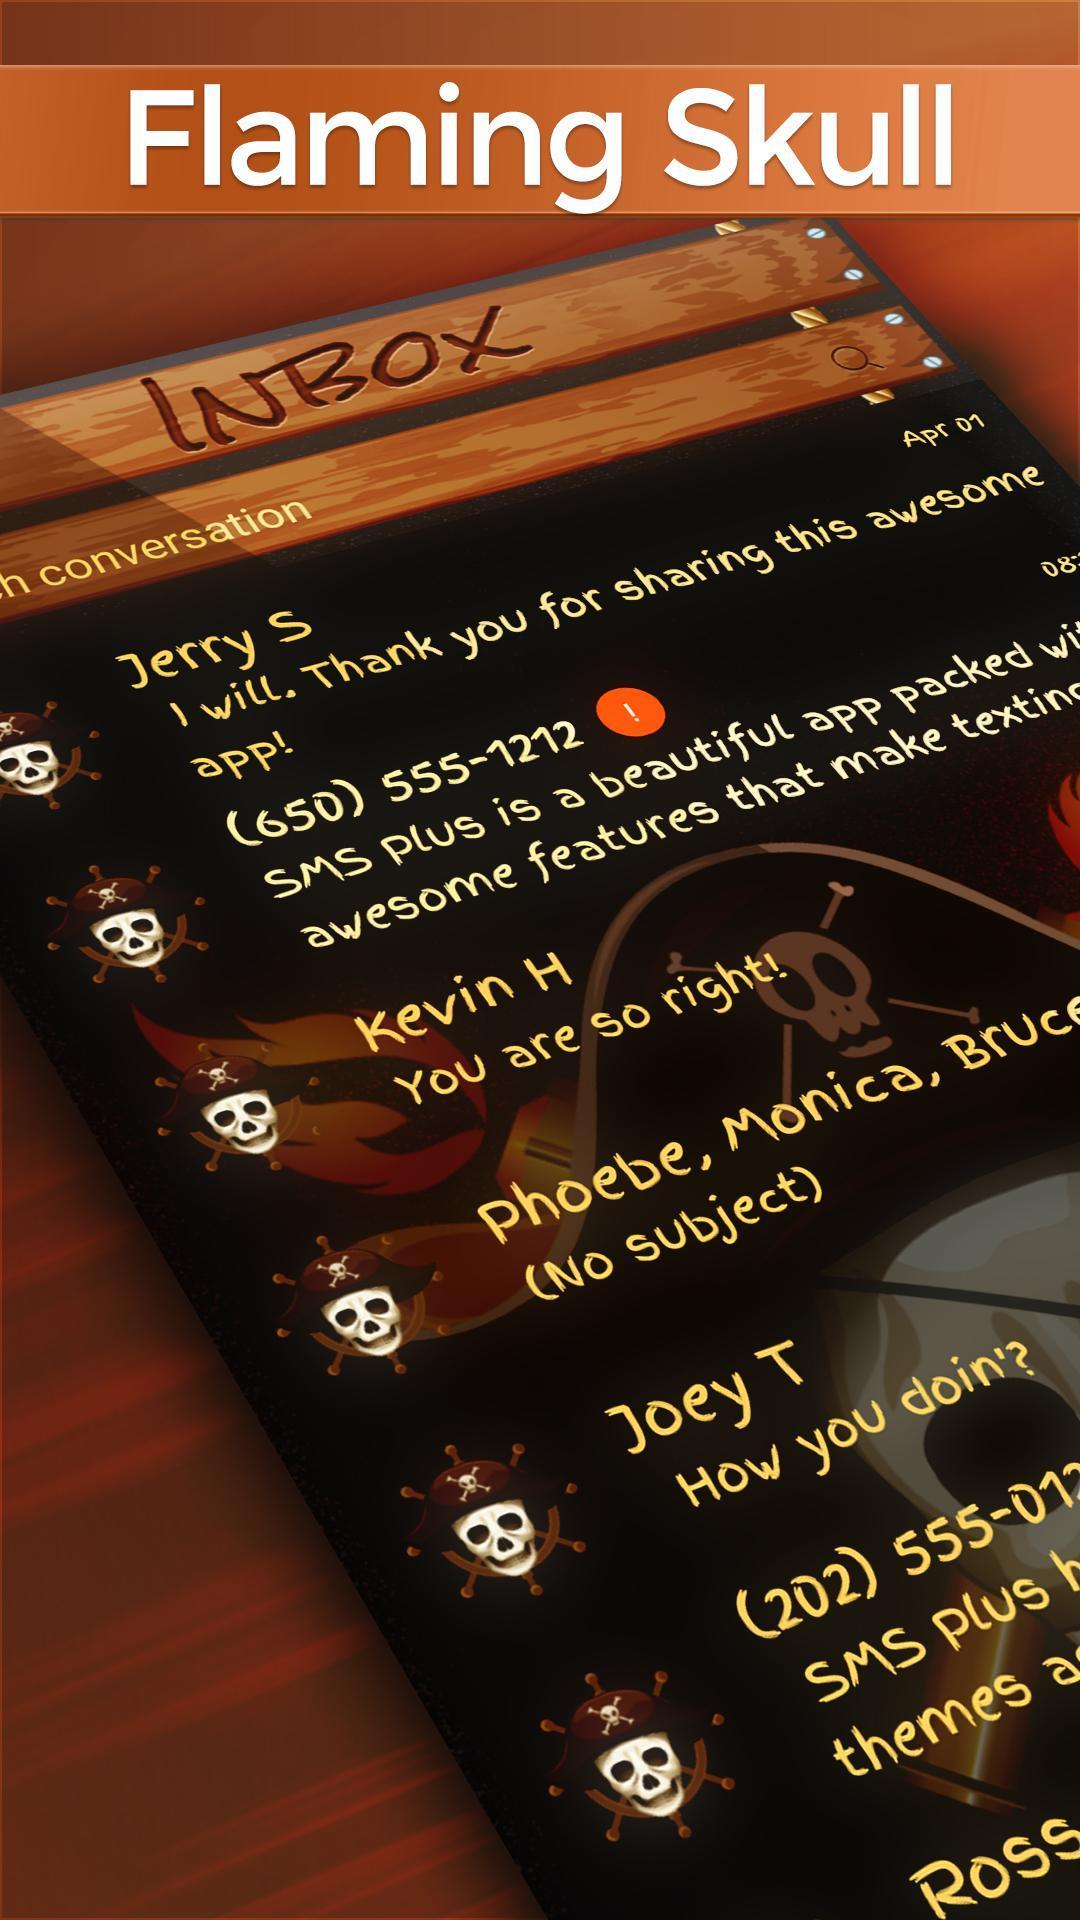 Flaming Skull SMS poster